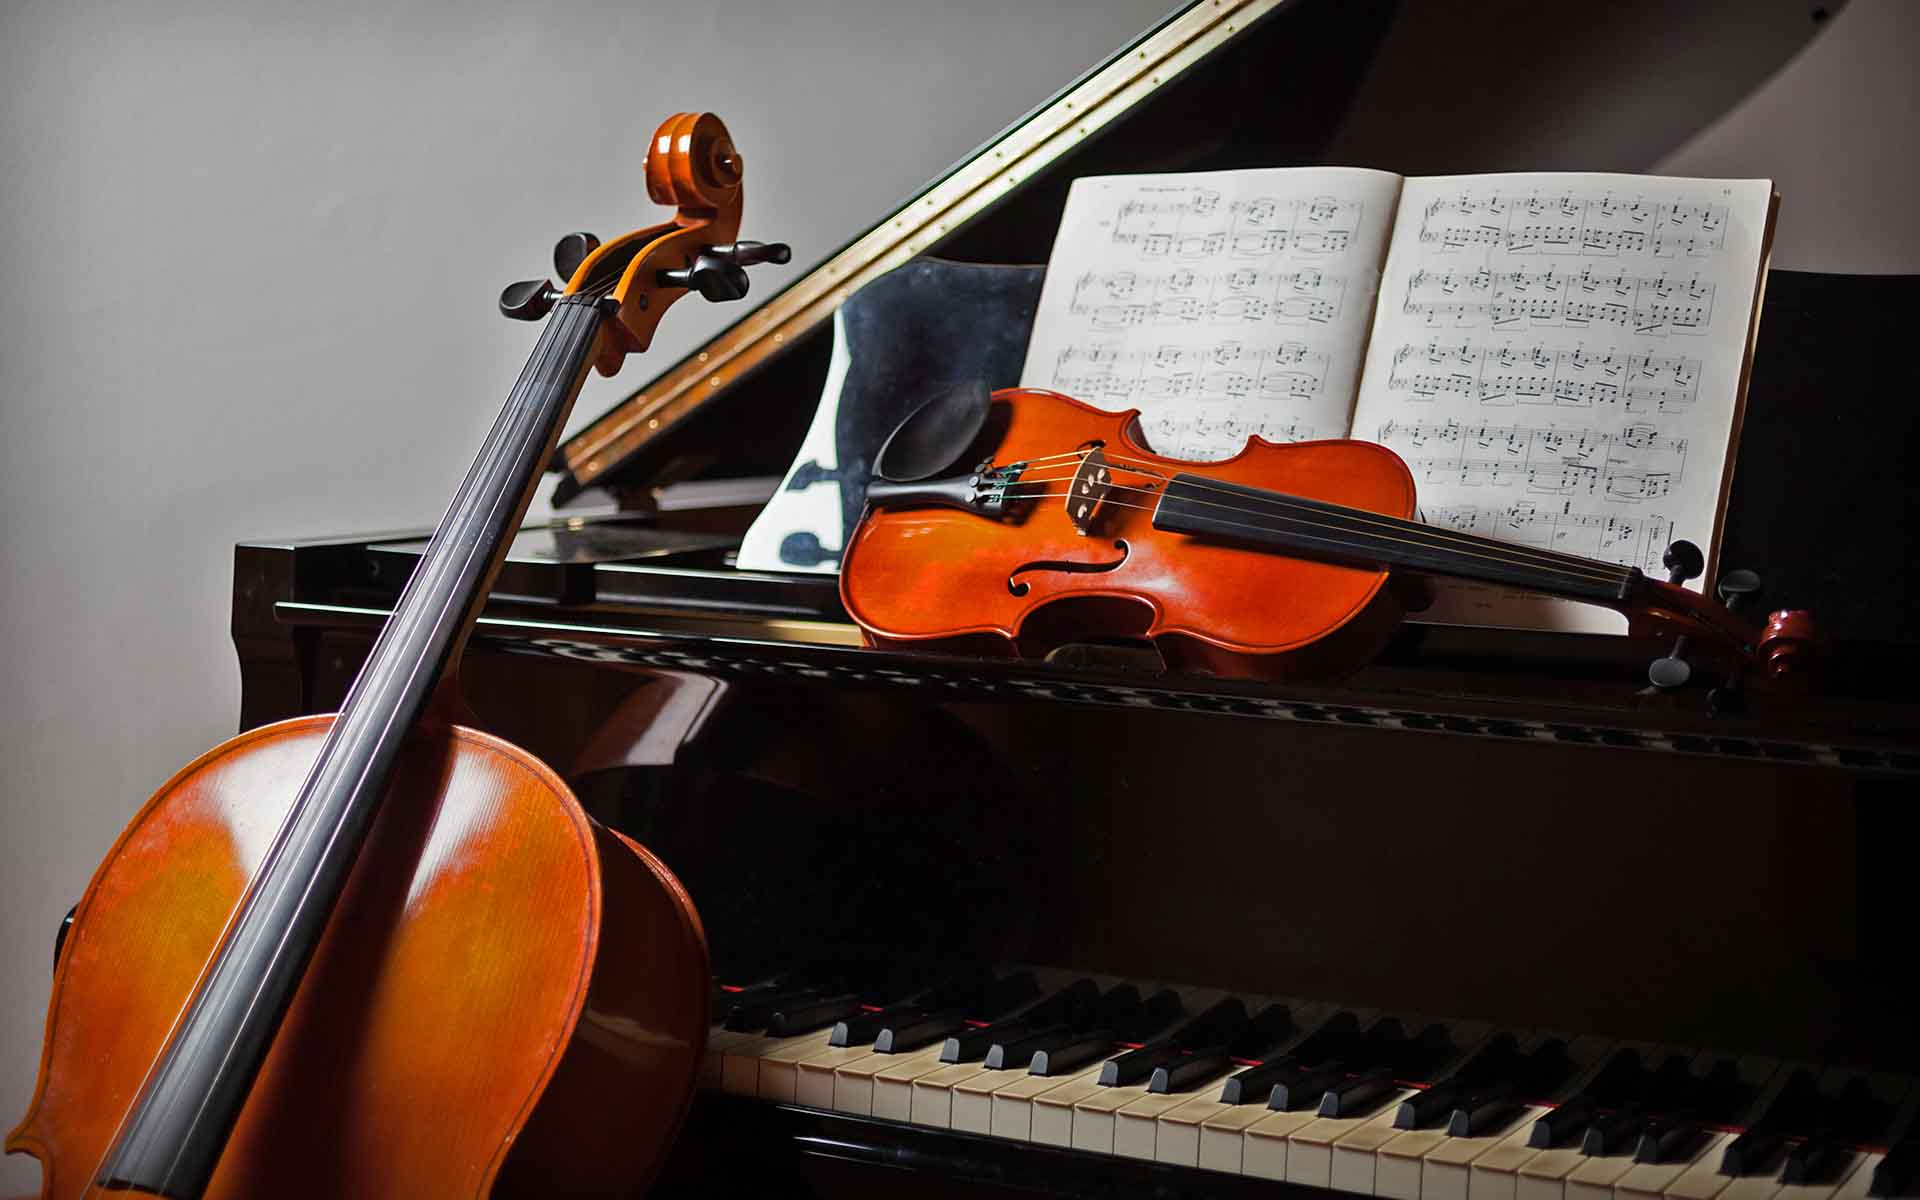 sonata music calgary music joy of learning music